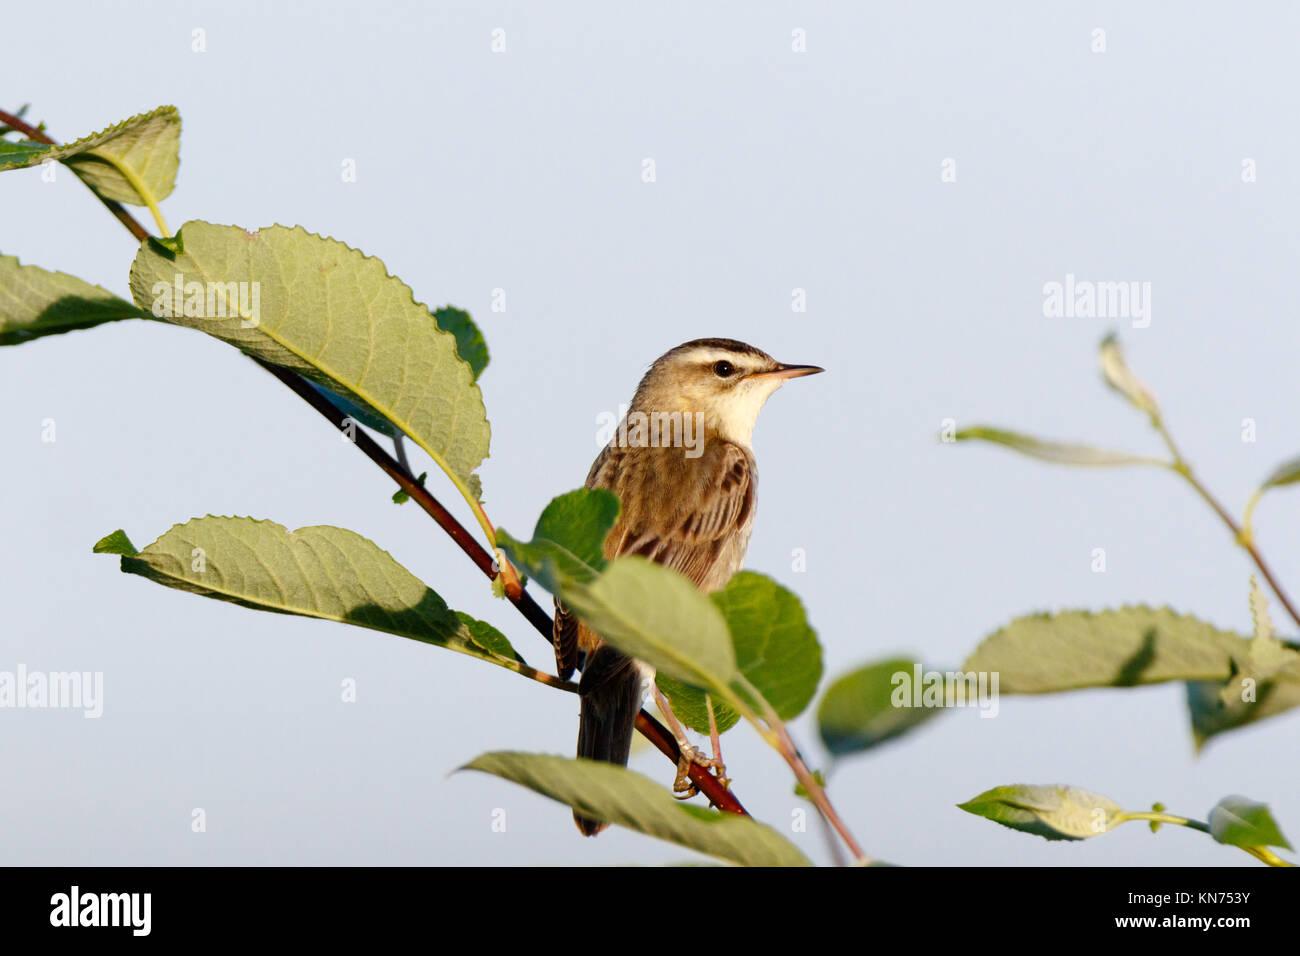 Sedge Warbler (Acrocephalus schoenobaenus). Russia, the Ryazan region (Ryazanskaya oblast), the Pronsky District. - Stock Image